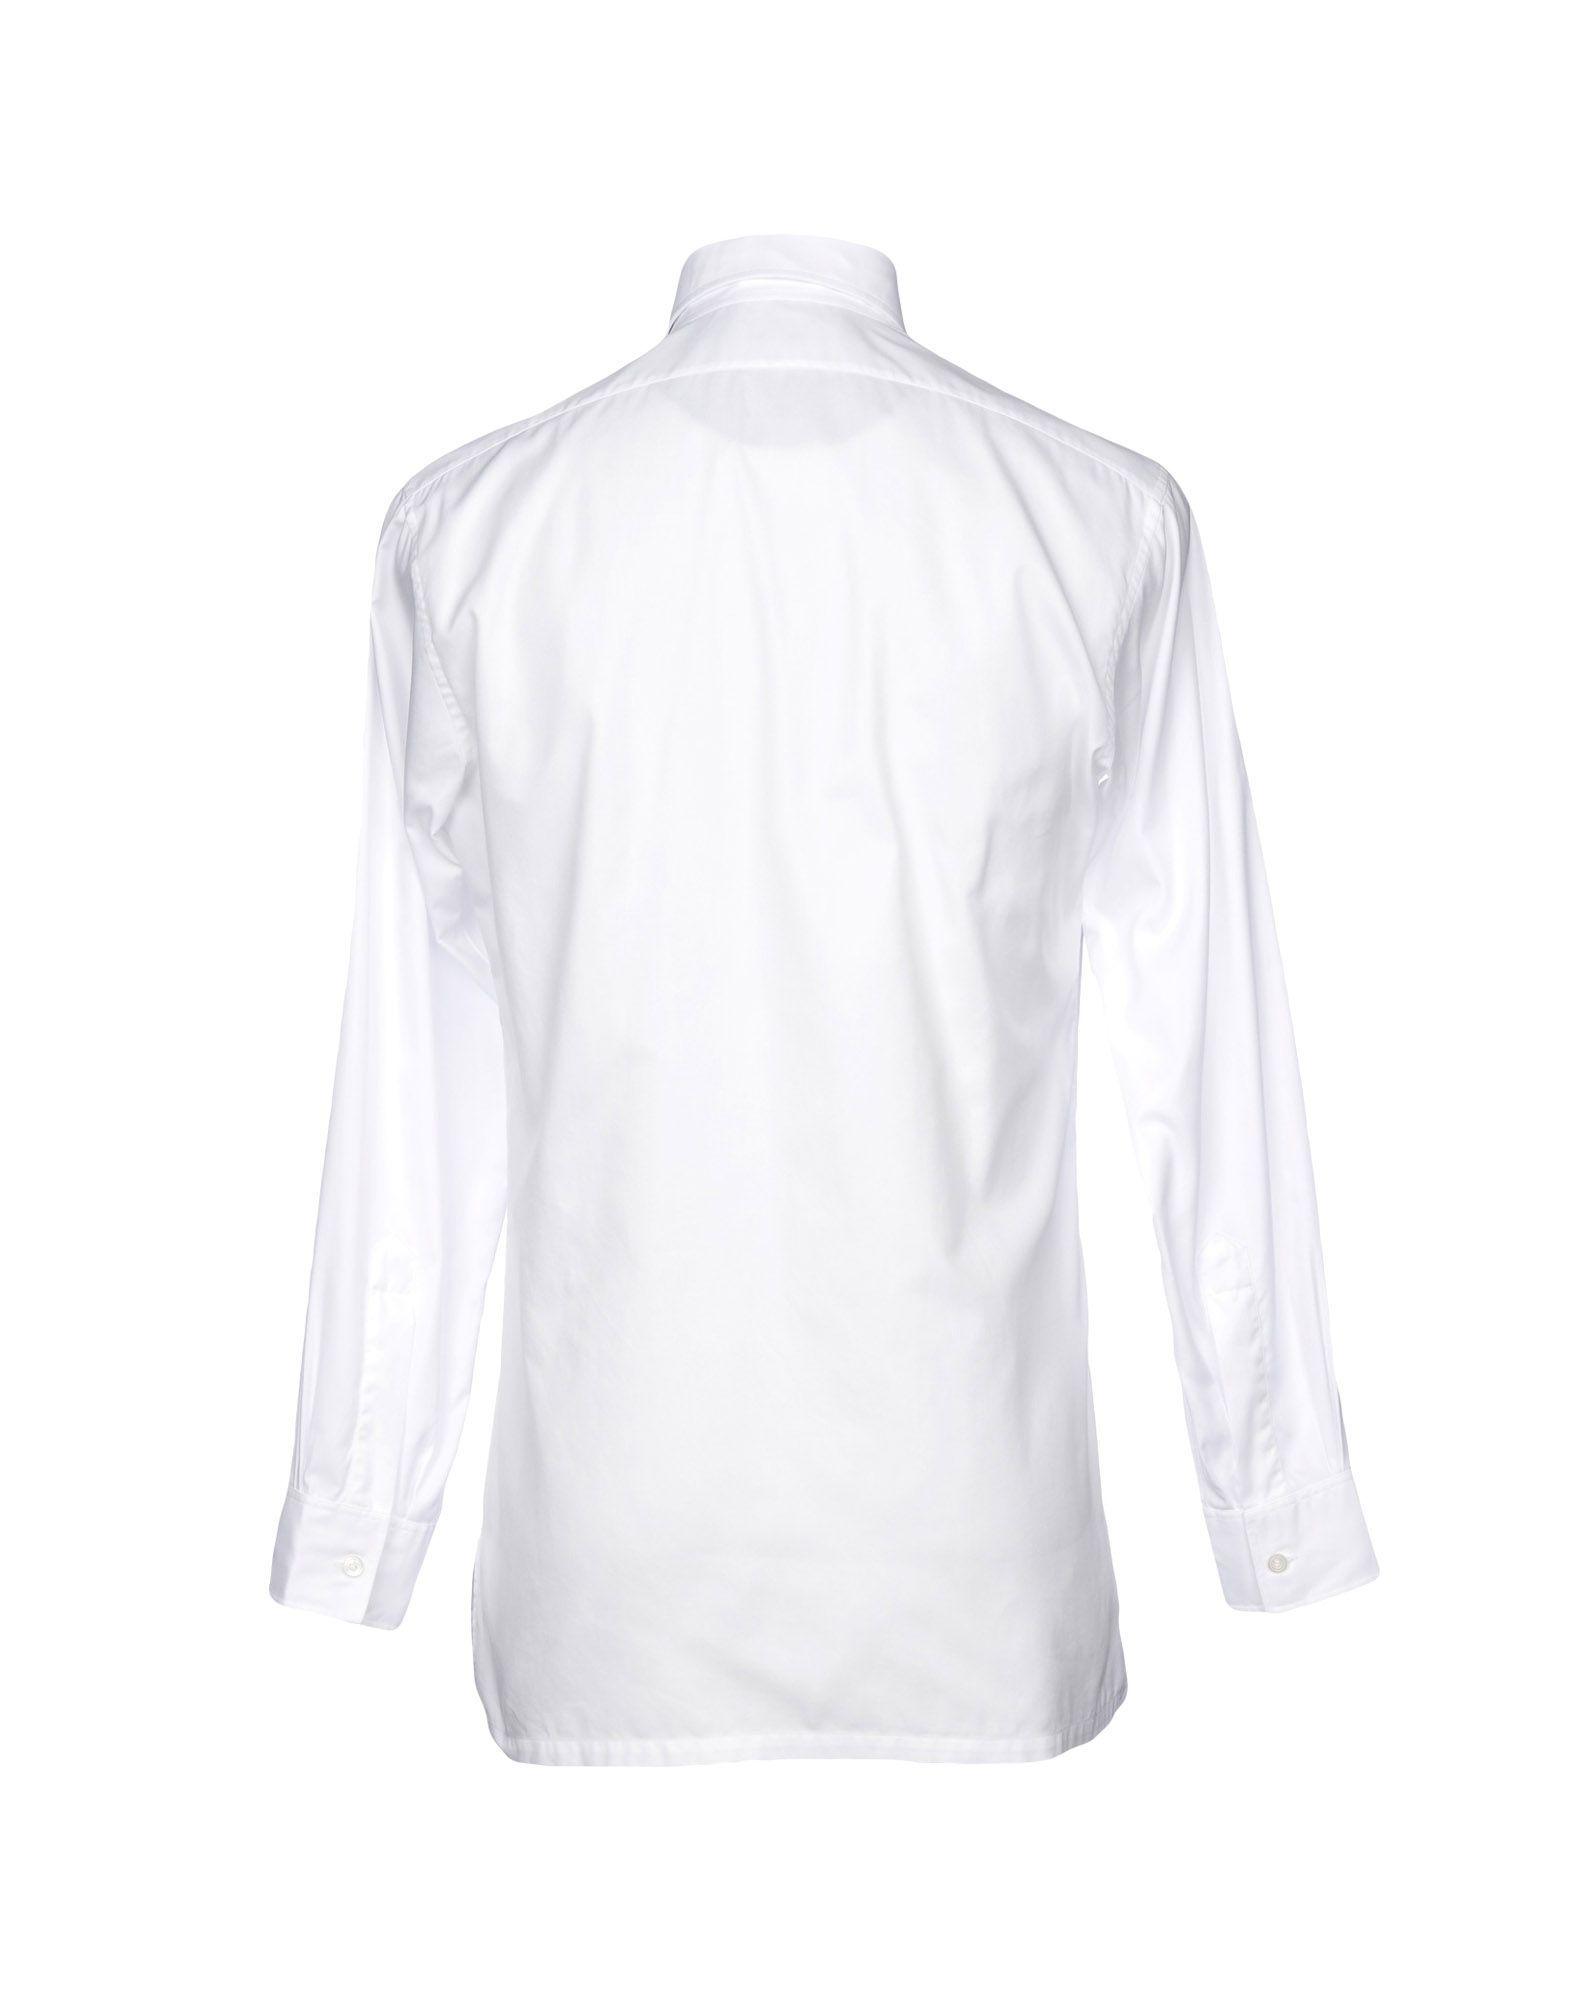 Charvet Man Shirts Cotton